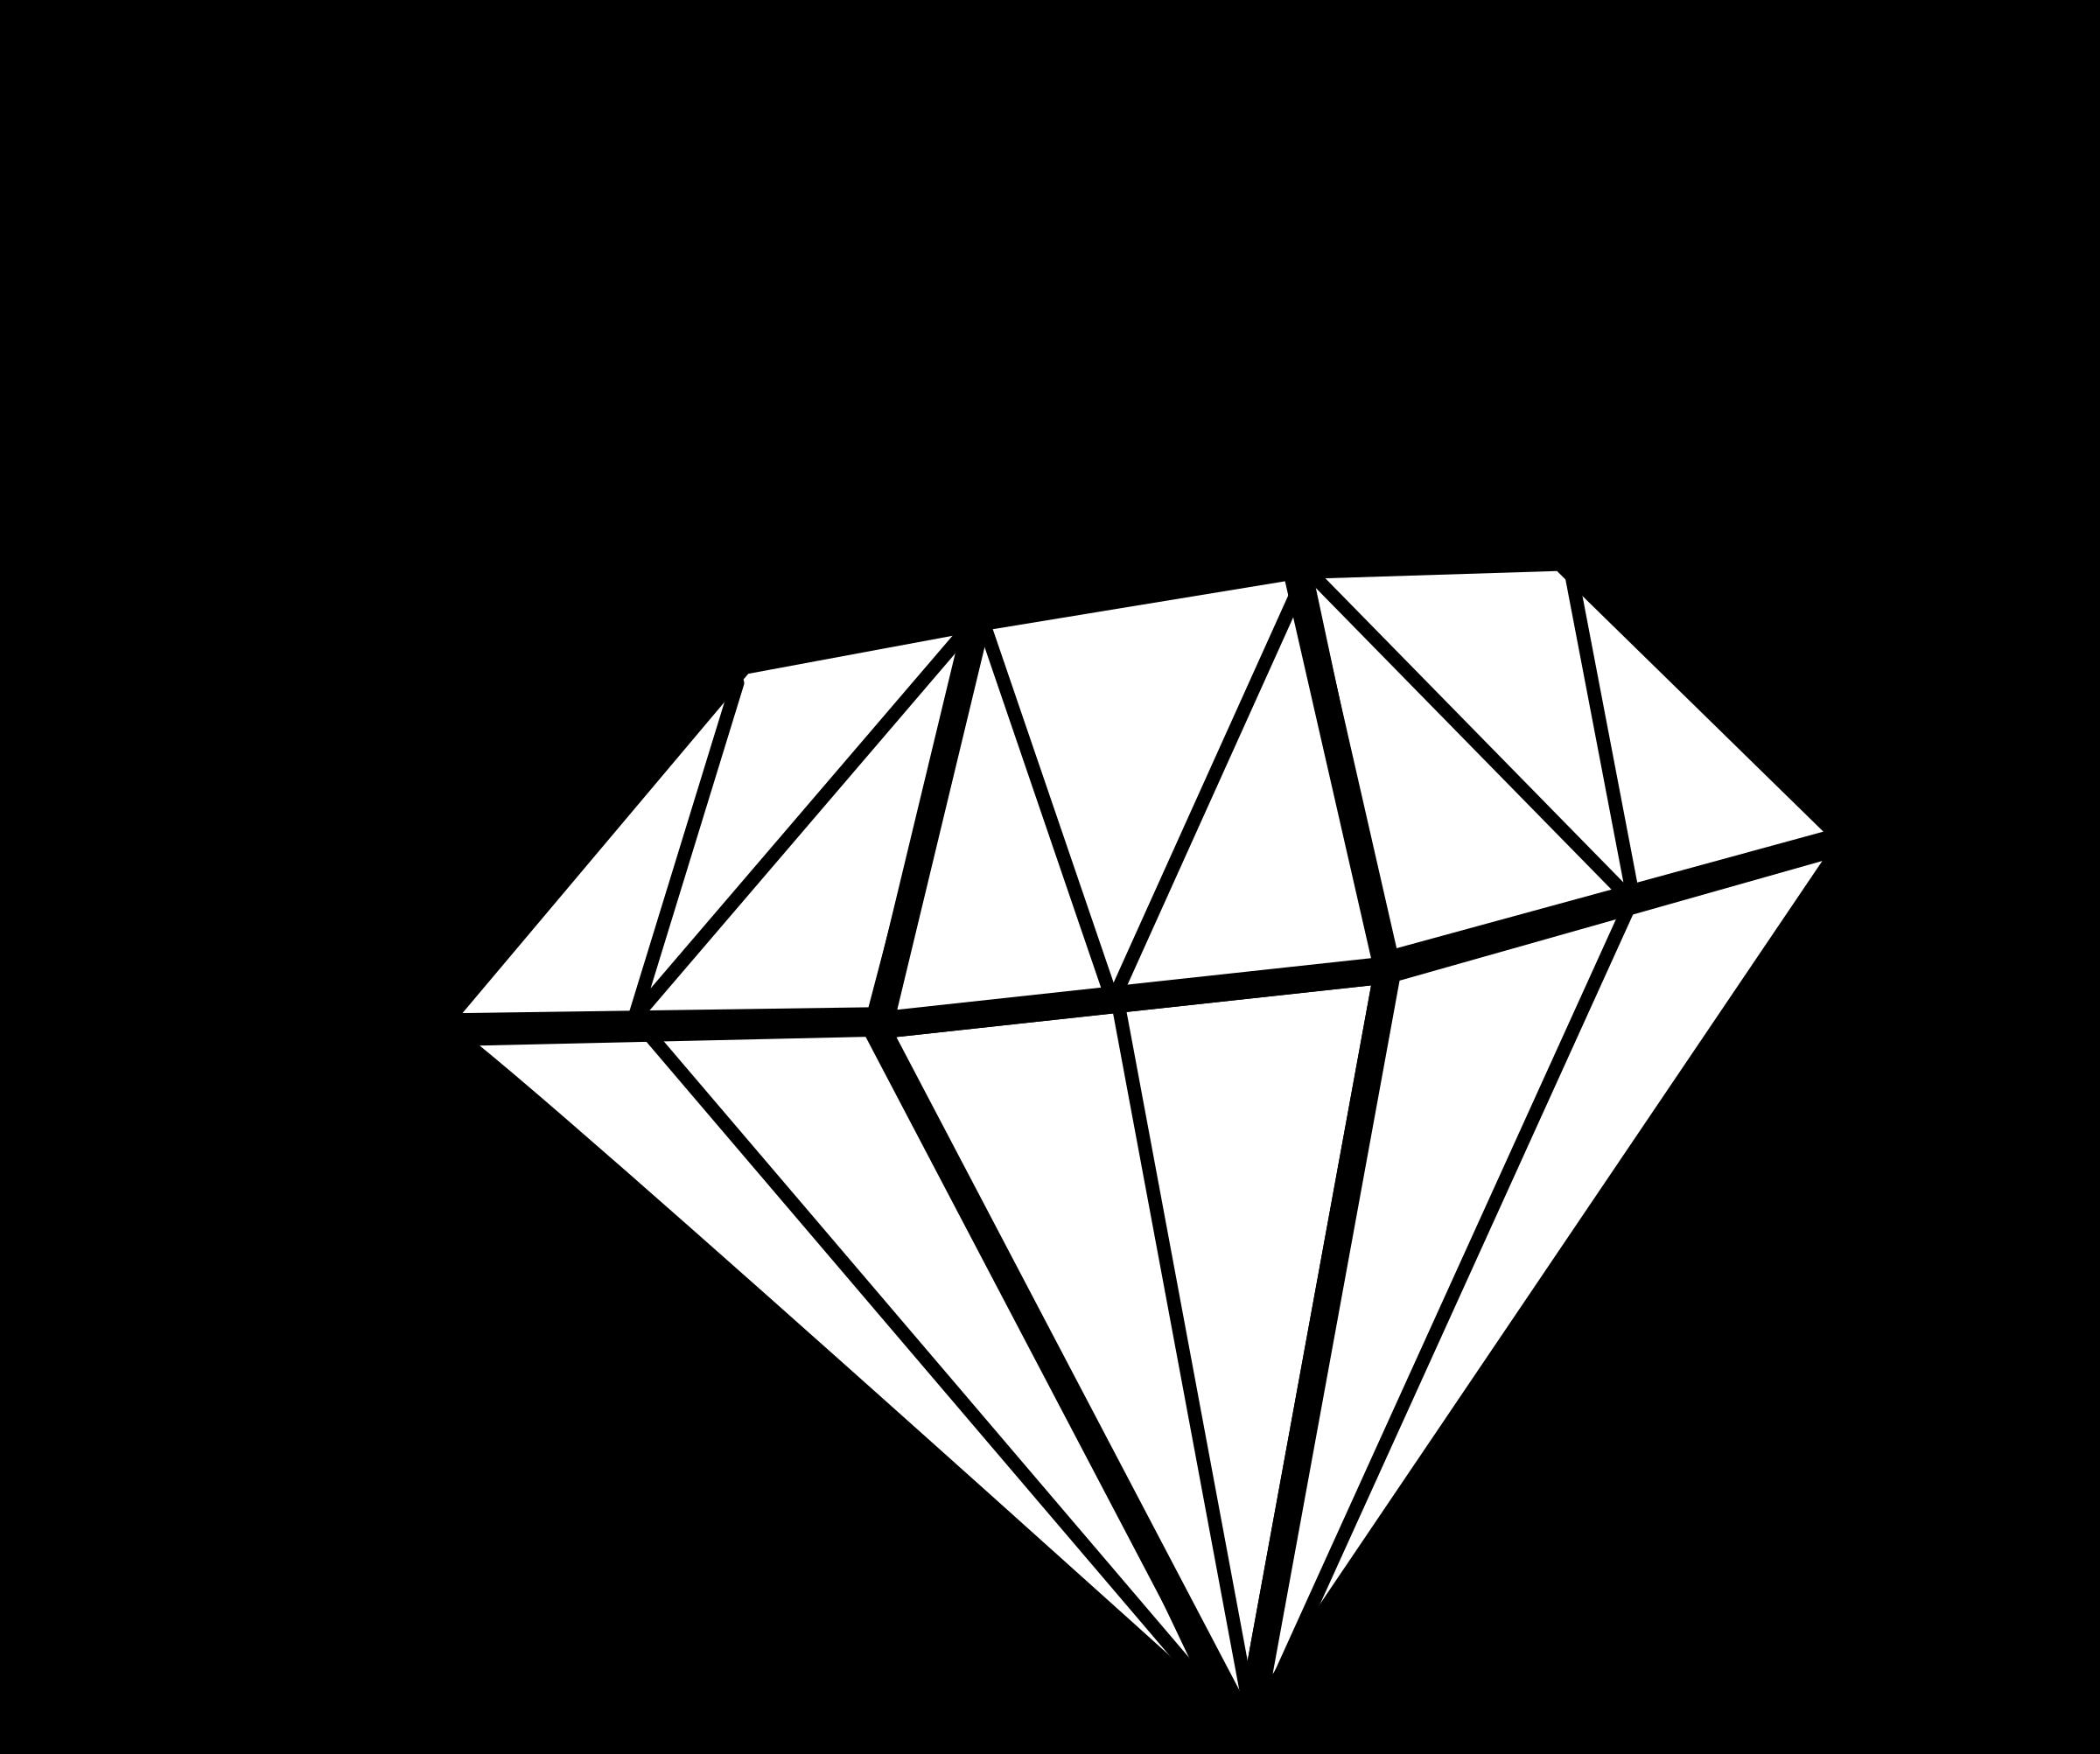 shiny diamond vector art image free stock photo public domain rh goodfreephotos com diamond vector logo diamond vector free download